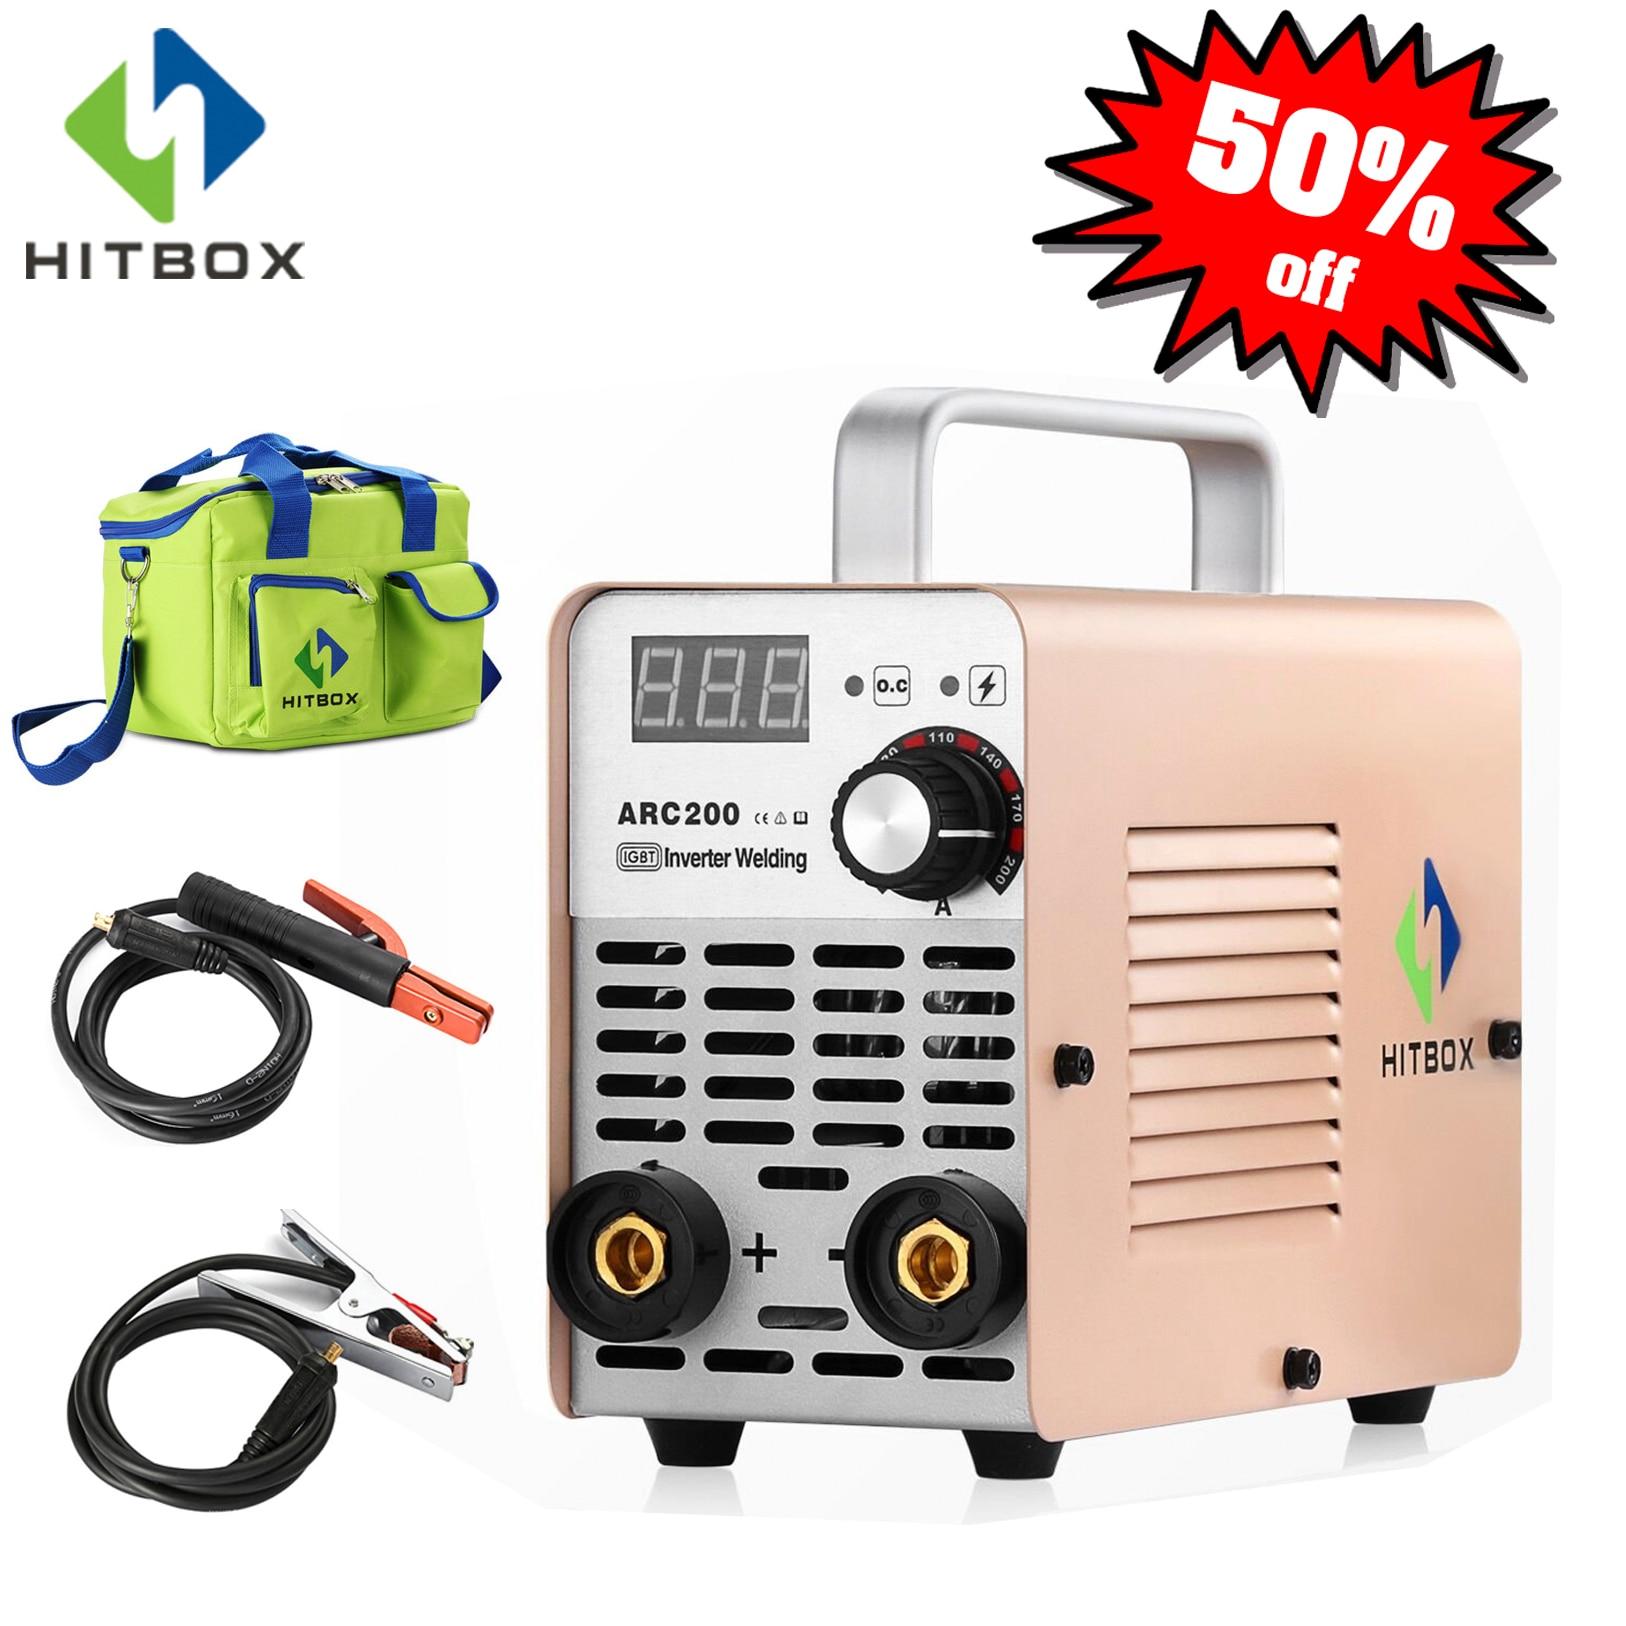 Hitbox inversor soldador arco mini arco 220 v tamanho pequeno soldador arc120 para uso doméstico 120a máquina de solda mma